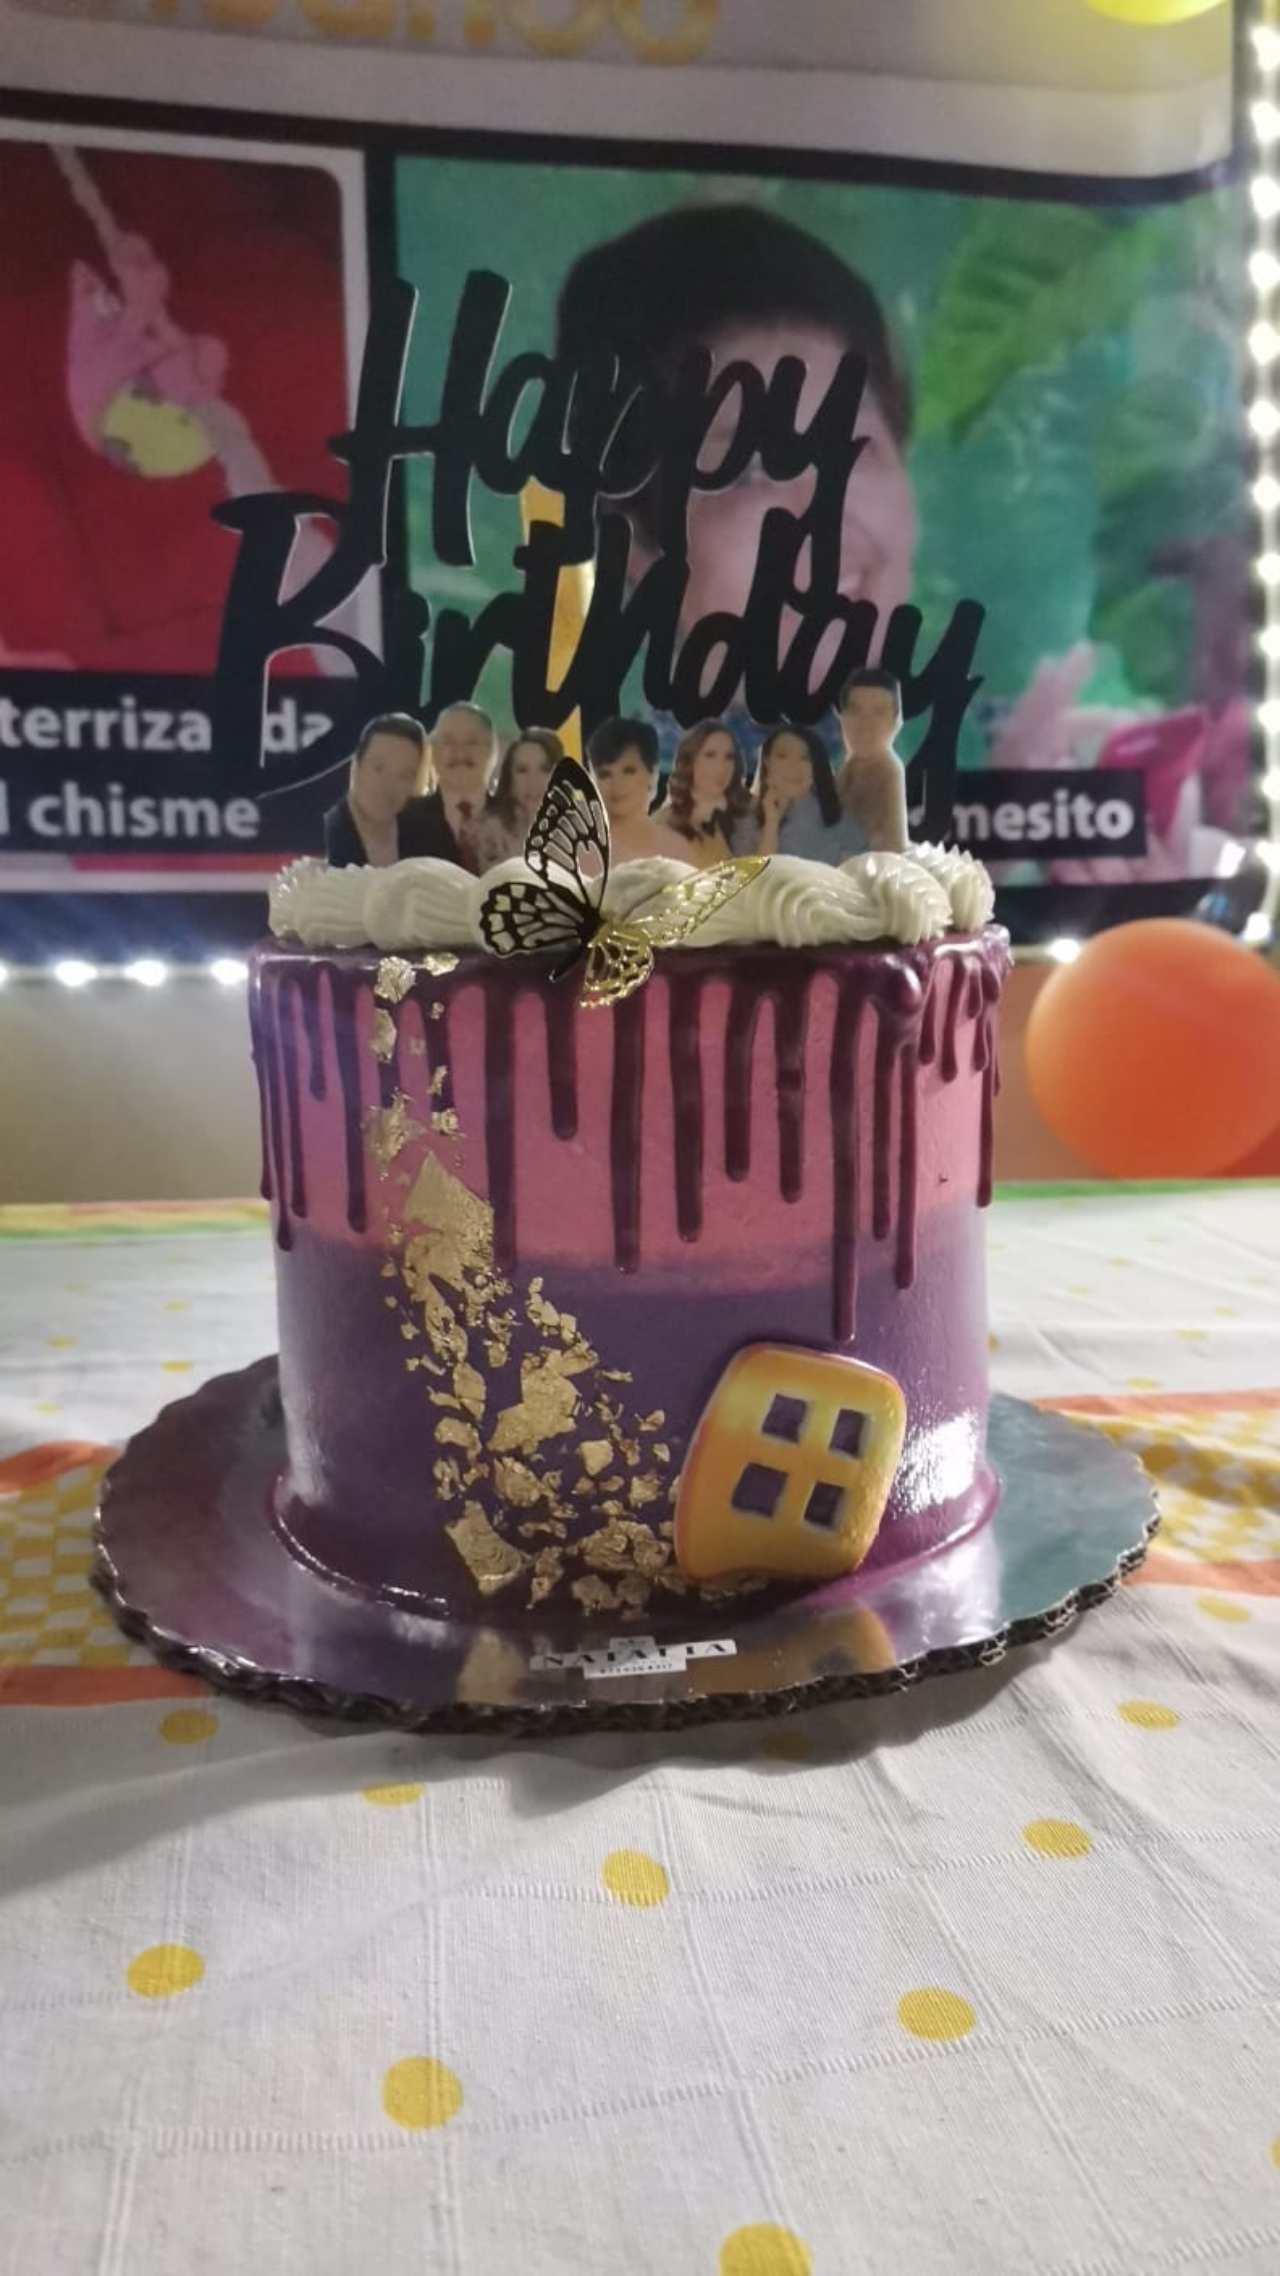 Mujer festeja cumpleaños fiesta temática Pati Chapoy